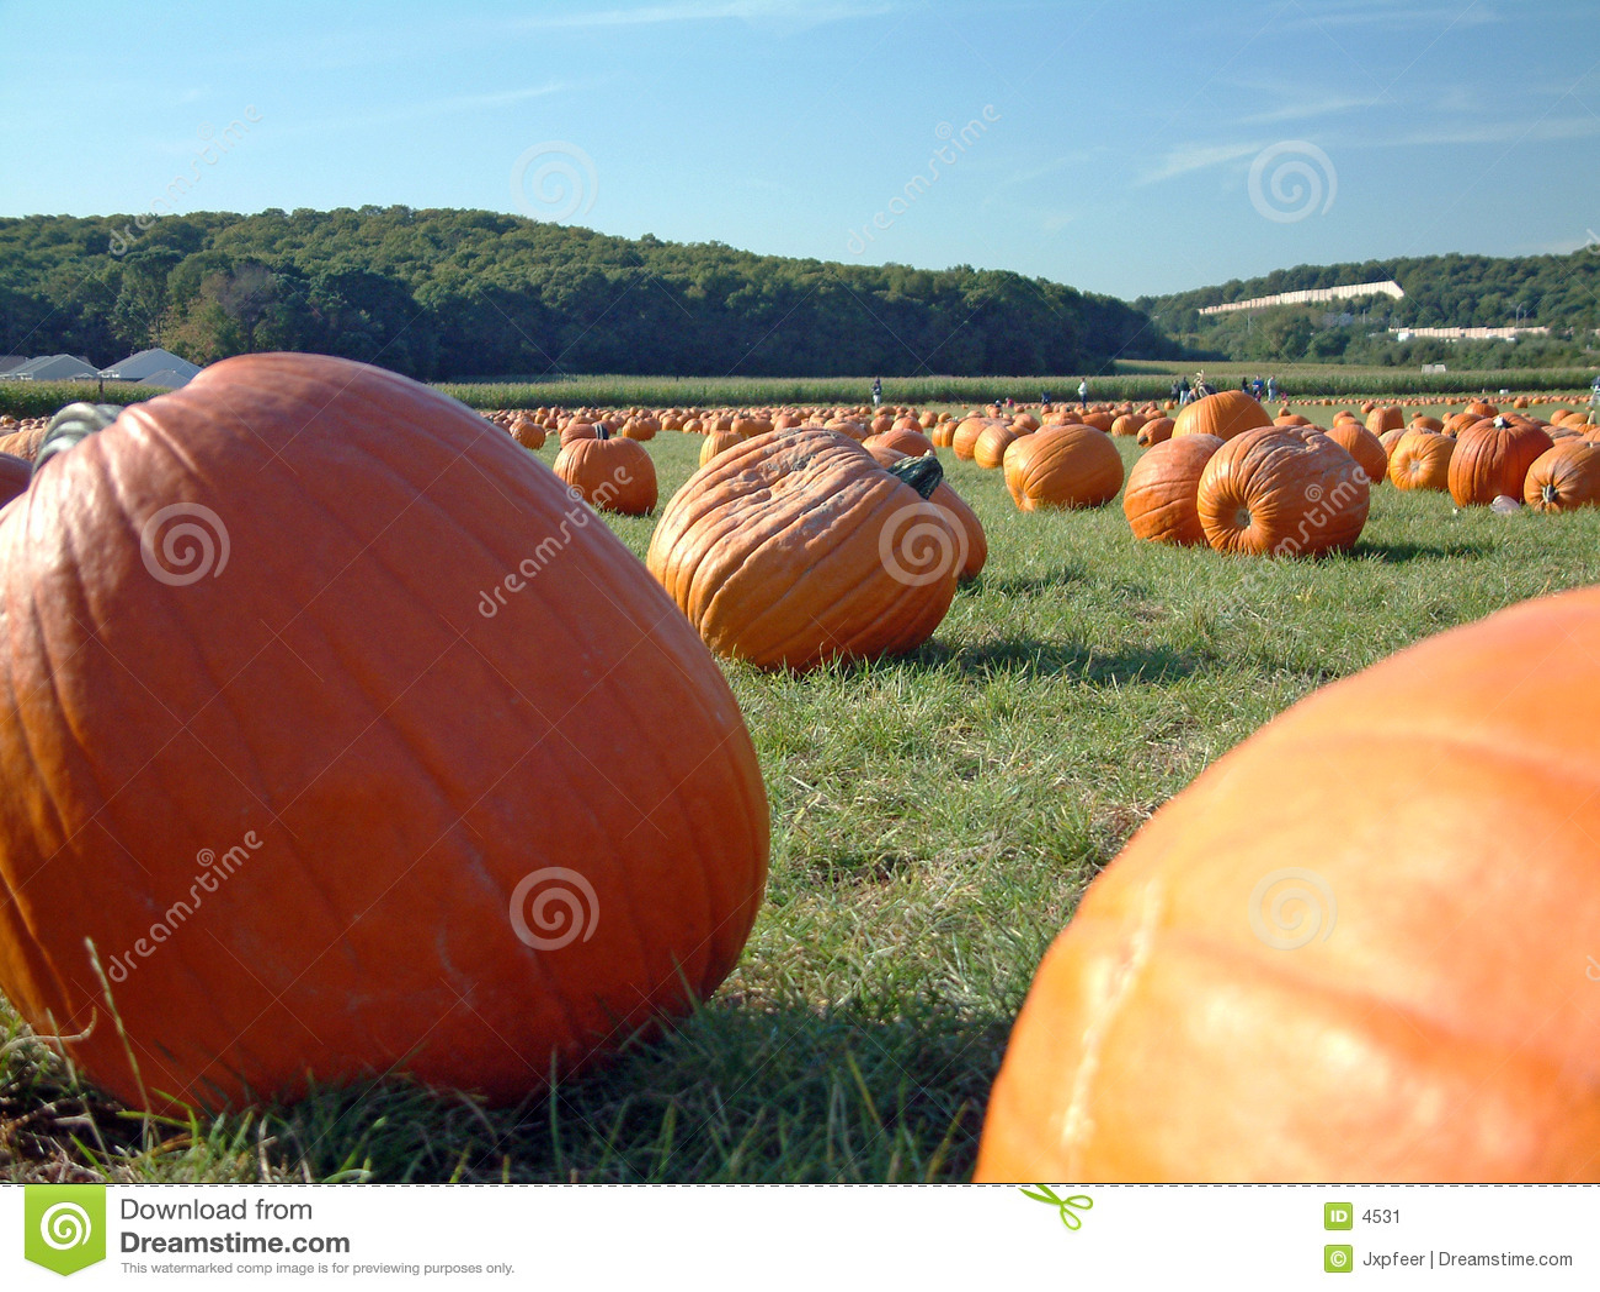 Pumpkin field 3